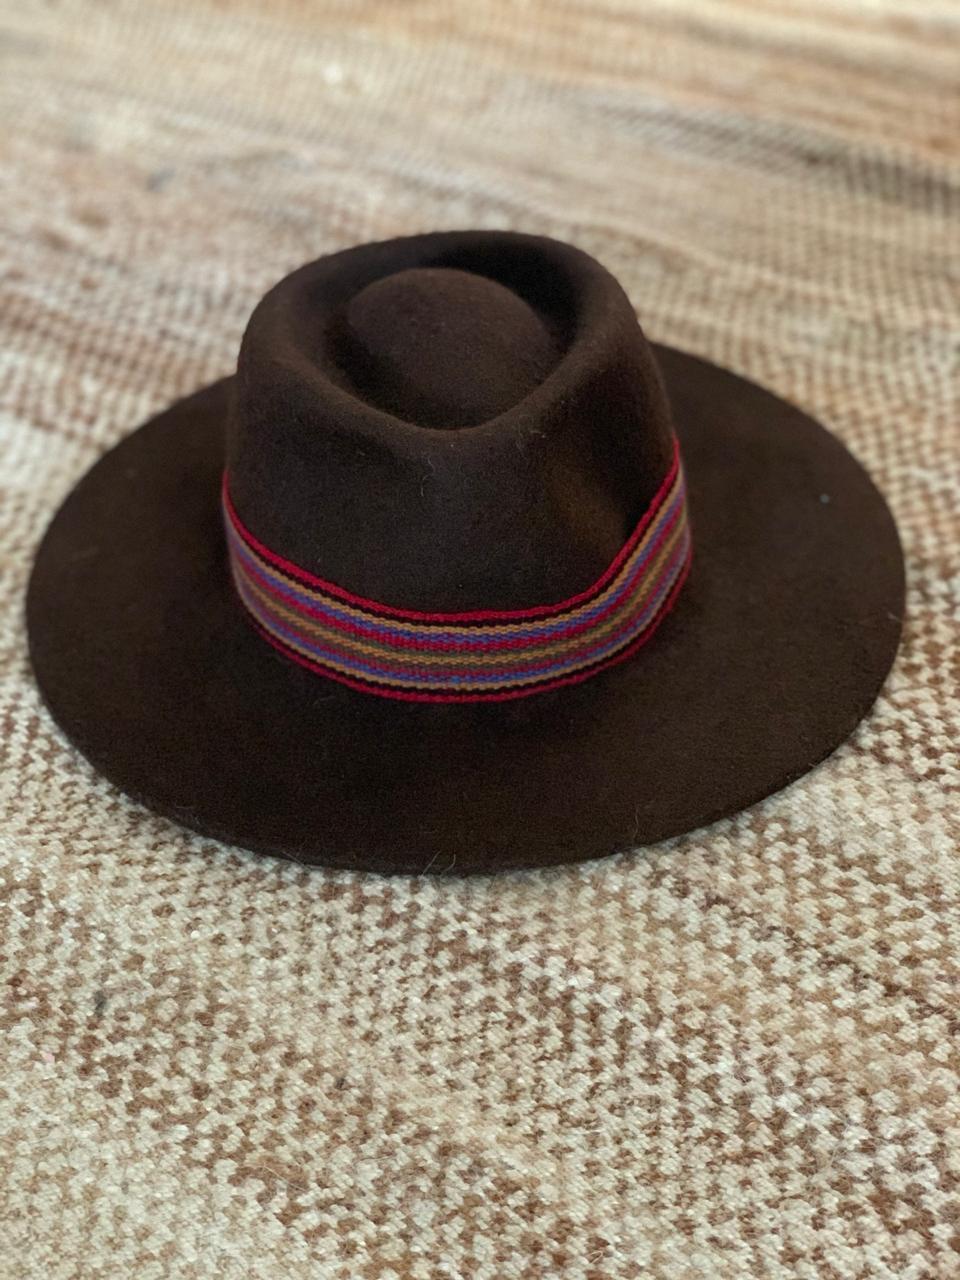 Cusco Brown 1 – 2